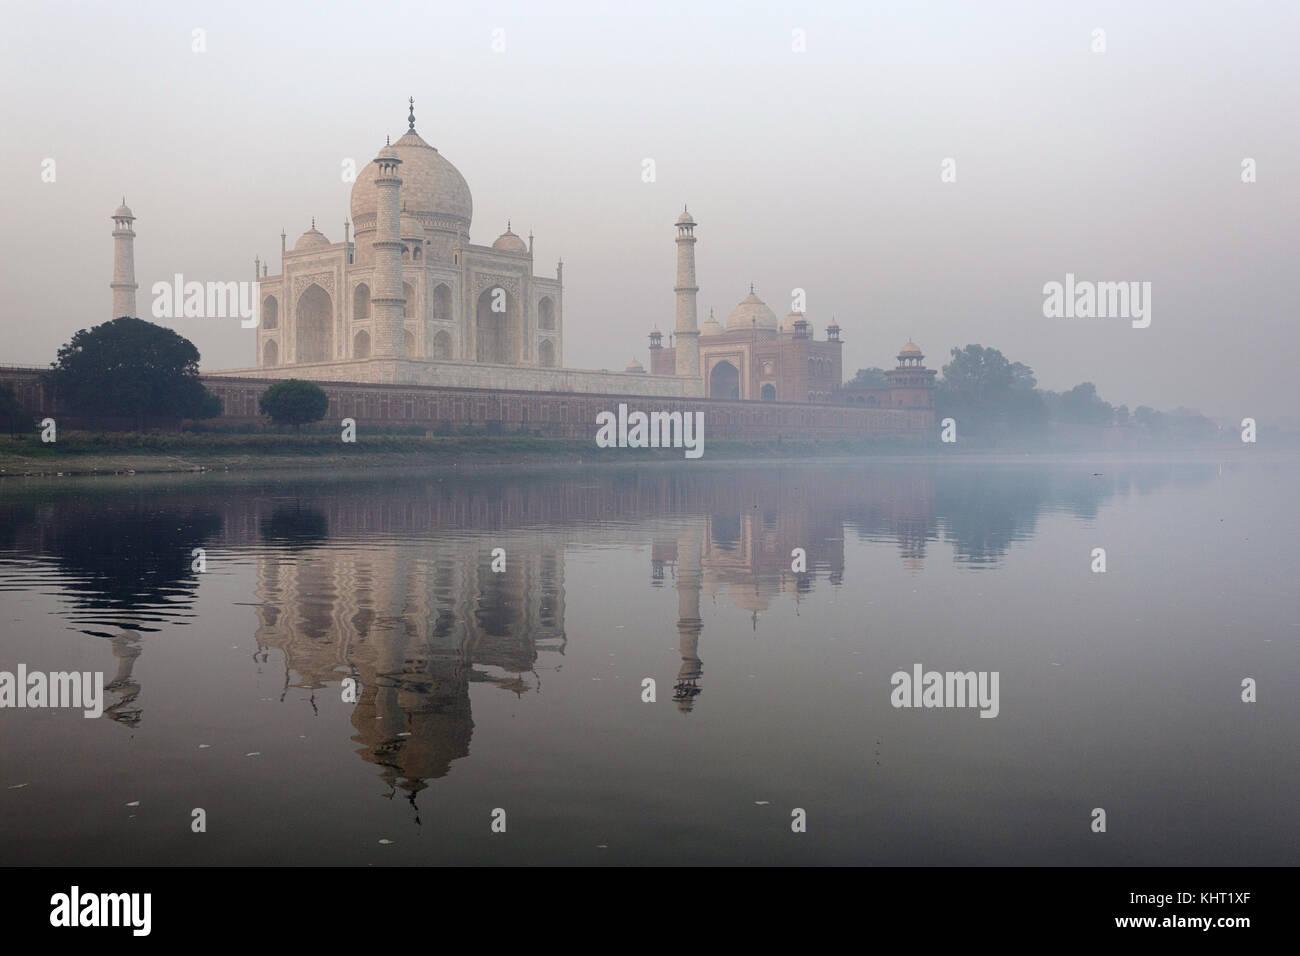 Morning reflection of Taj Mahal in Yamuna river, UNESCO World Heritage Site, Agra, Uttar Pradesh, India, Asia. - Stock Image